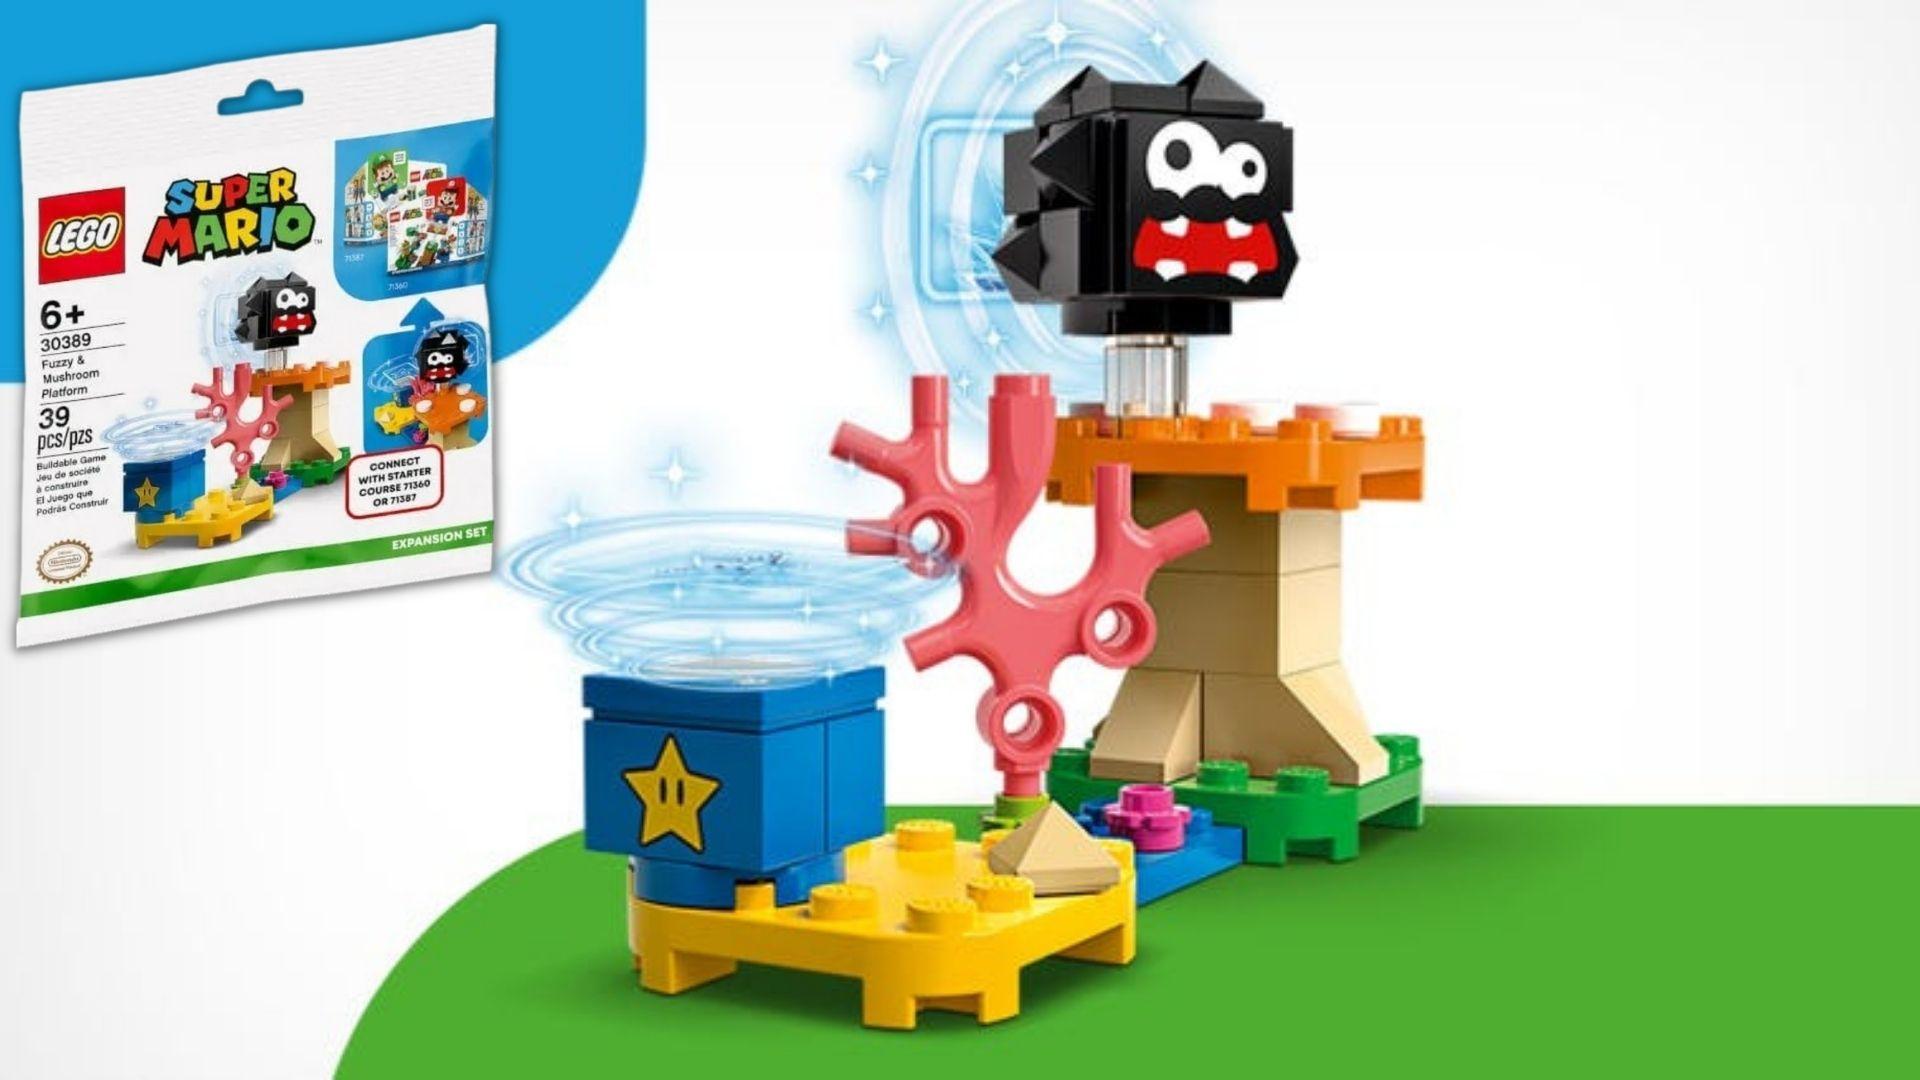 Gratis LEGO Fuzzy & Mushroom Platform Polybag